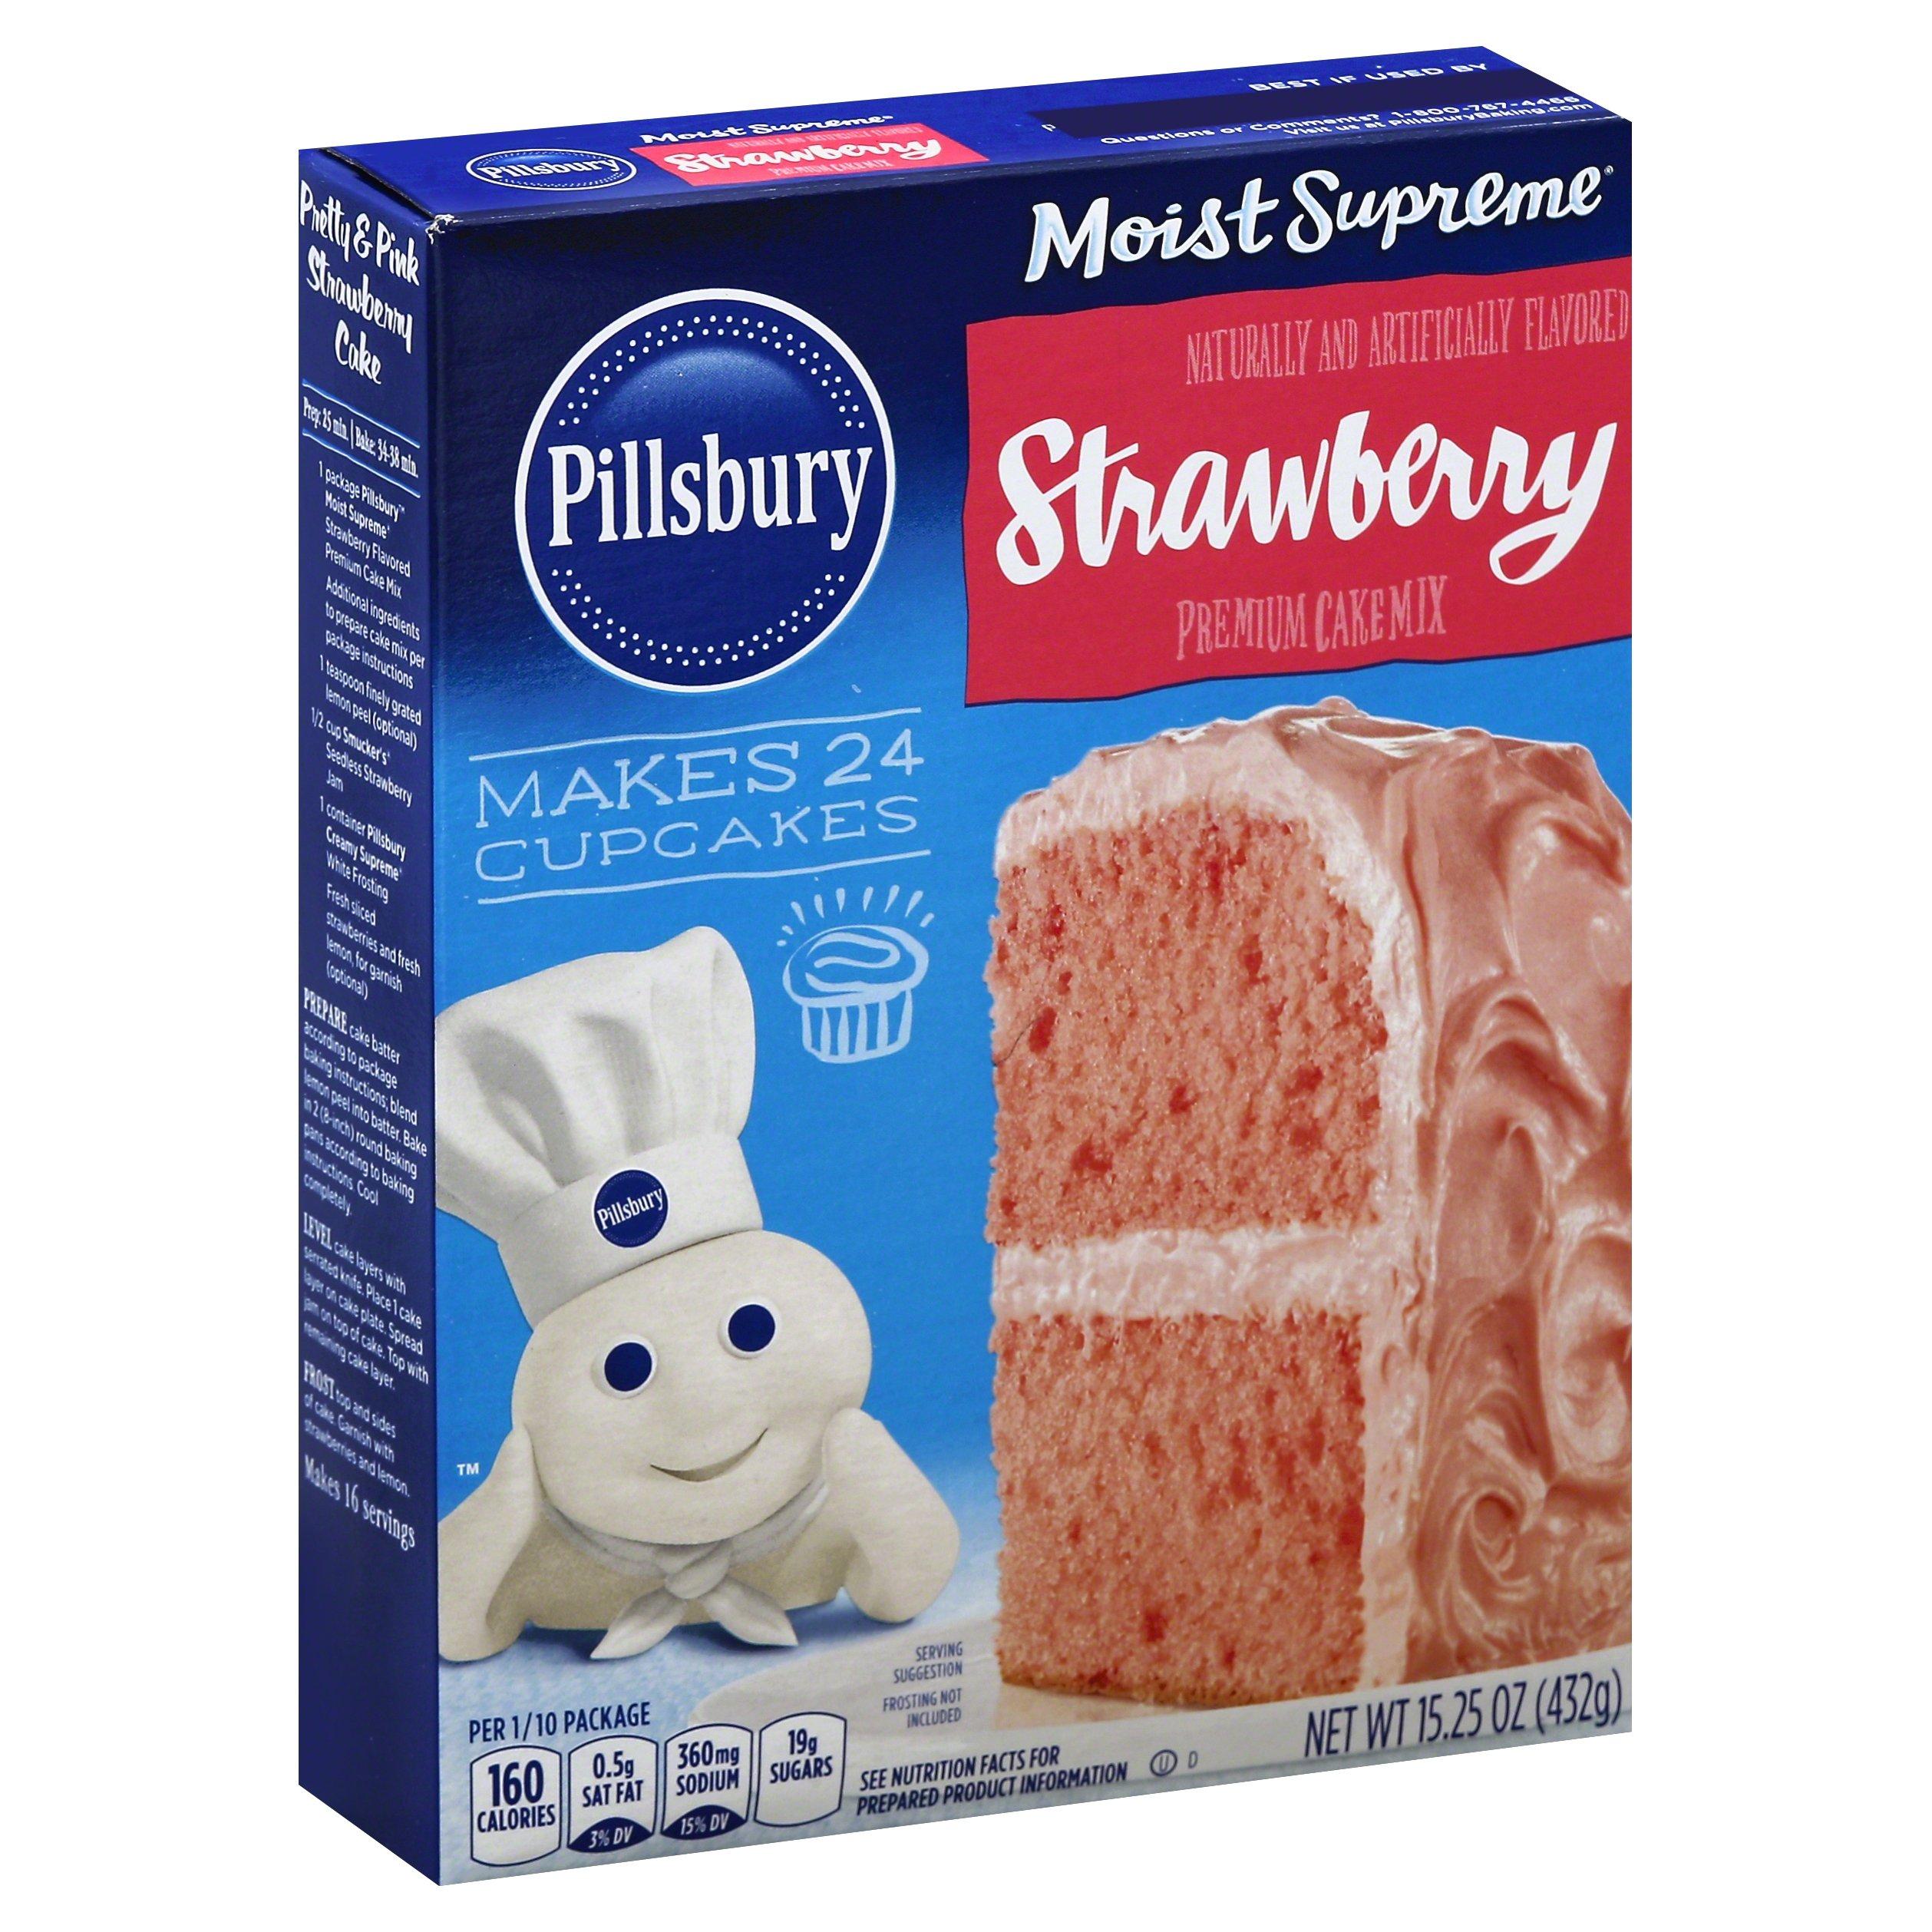 Pillsbury Cake Mix Moist Supreme Strawberry, 15.25 oz